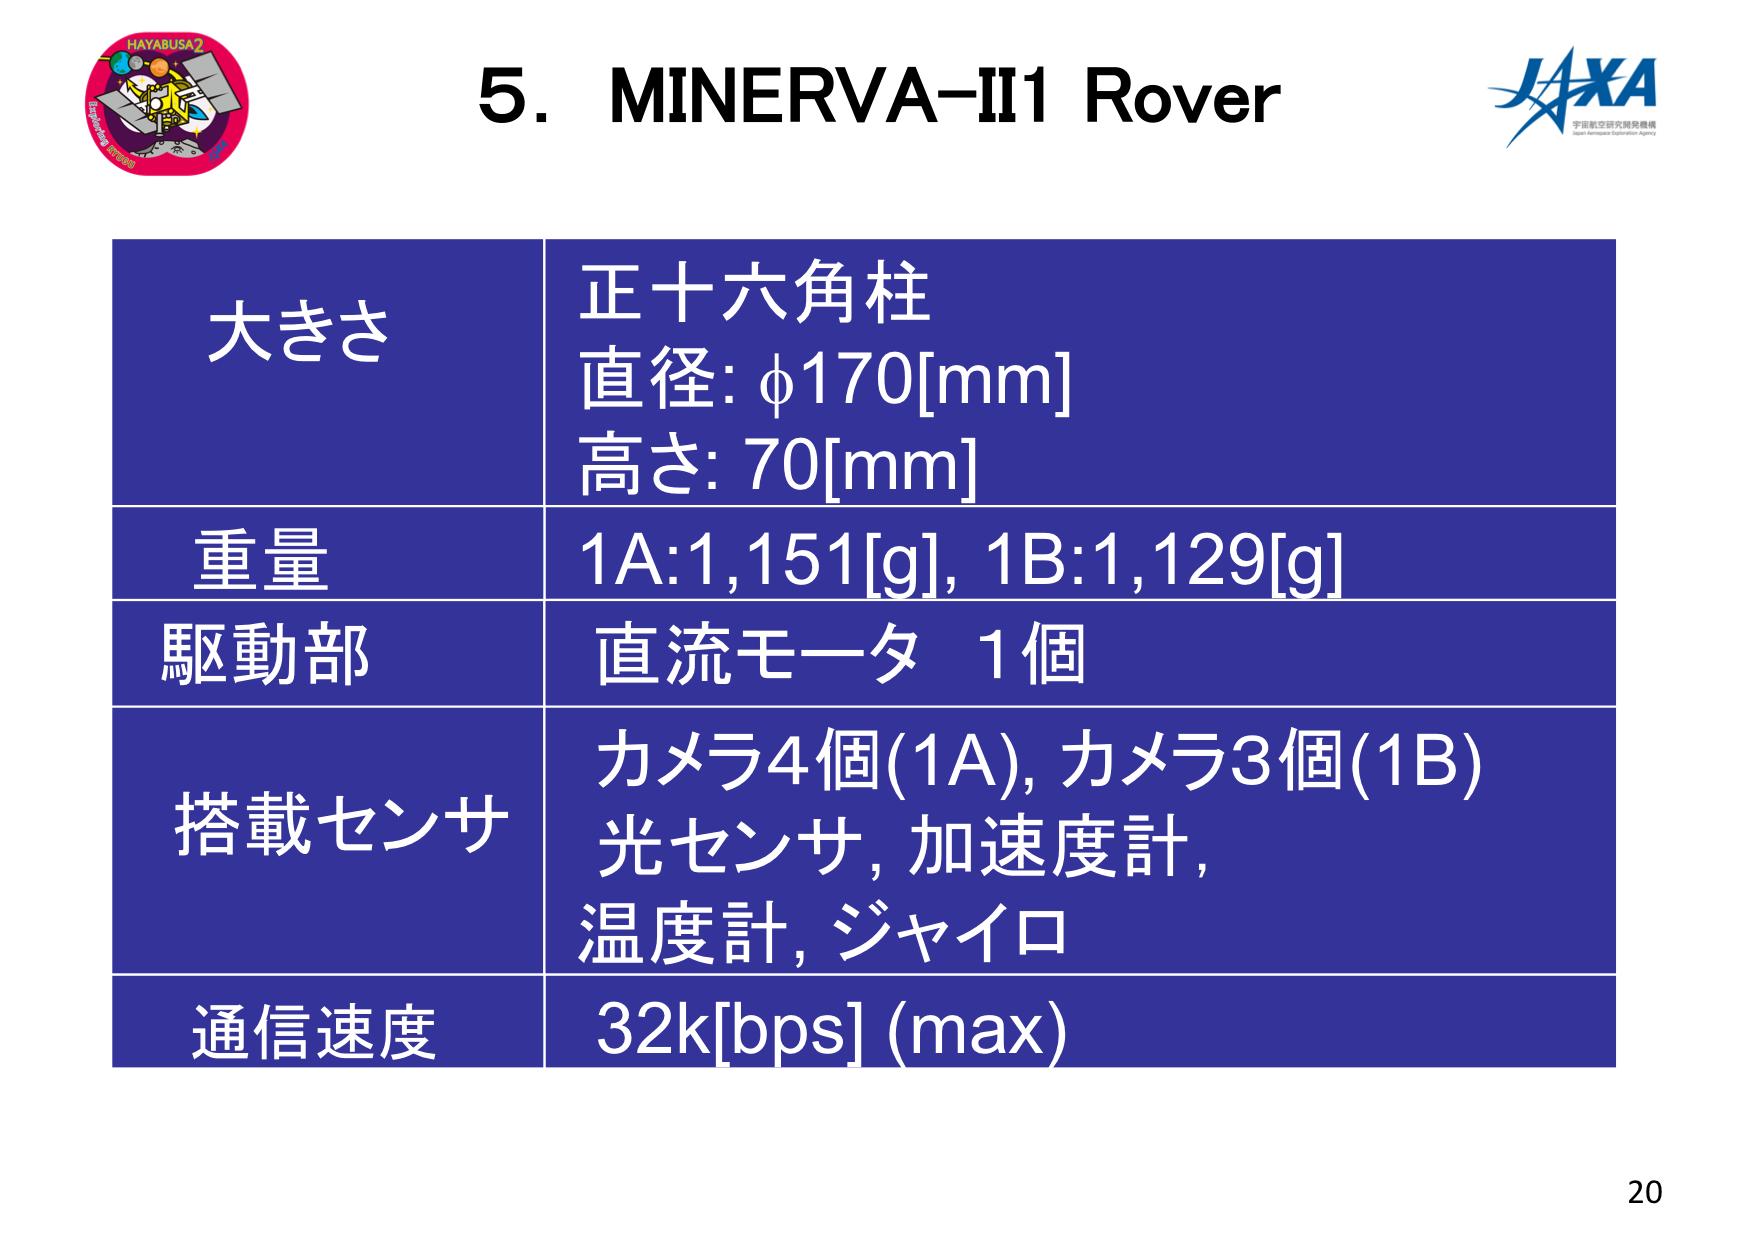 f:id:Imamura:20180905231952p:plain